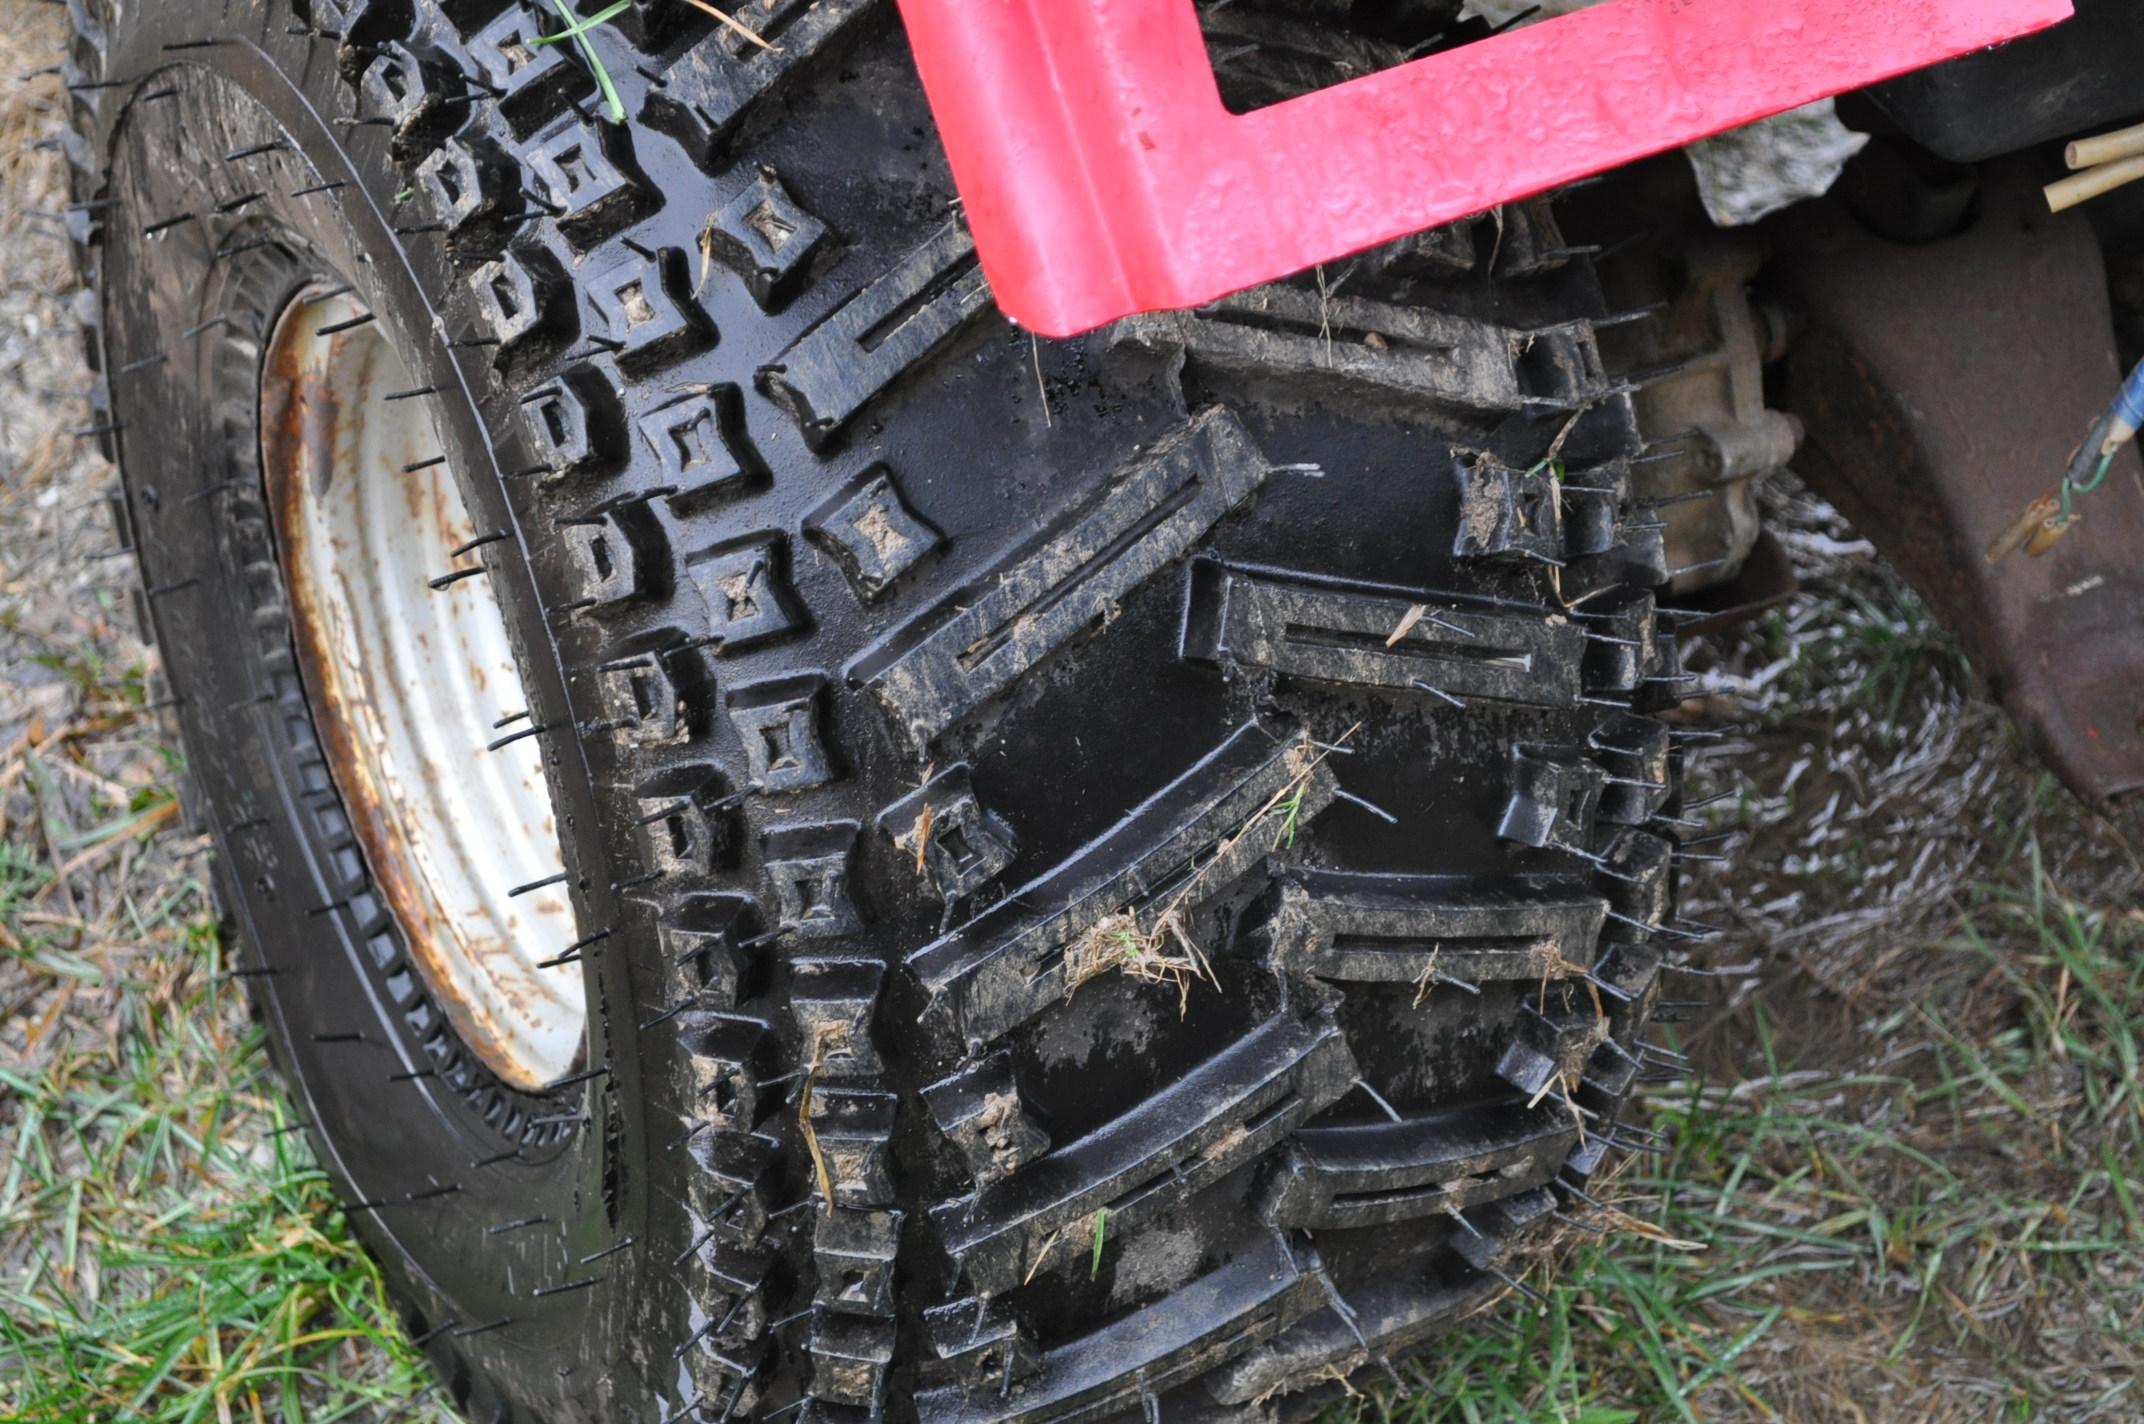 Honda Big Red 3-wheeler, new 25 x 12.00-9 tires - Image 6 of 8